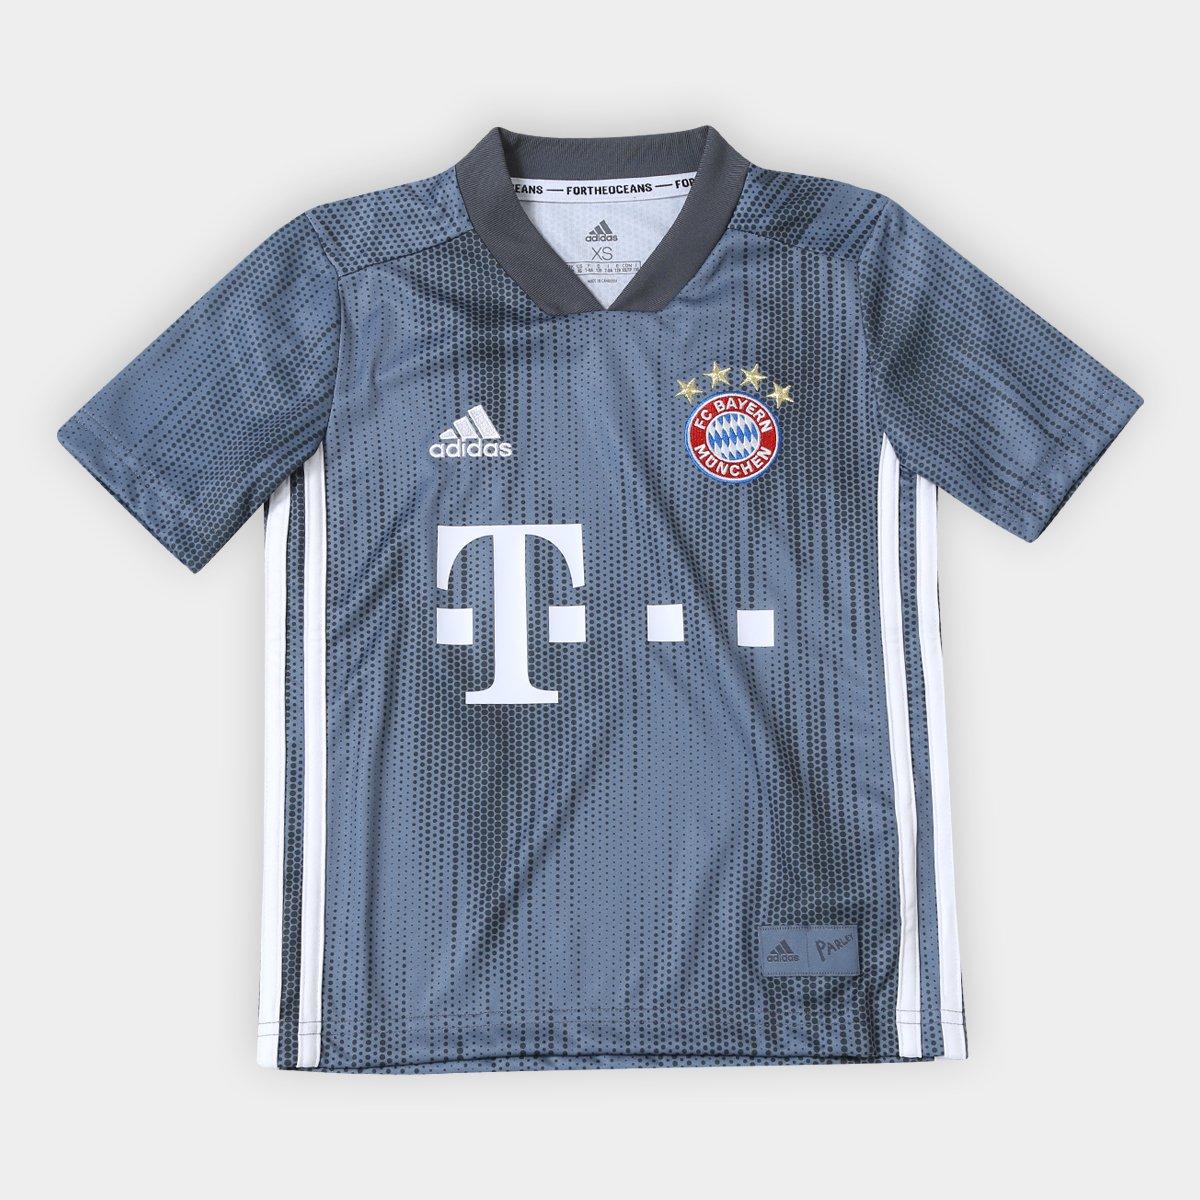 160ceb66a9b Camisa Infantil Bayern de Munique Third 2018 s n° - Torcedor Adidas ...